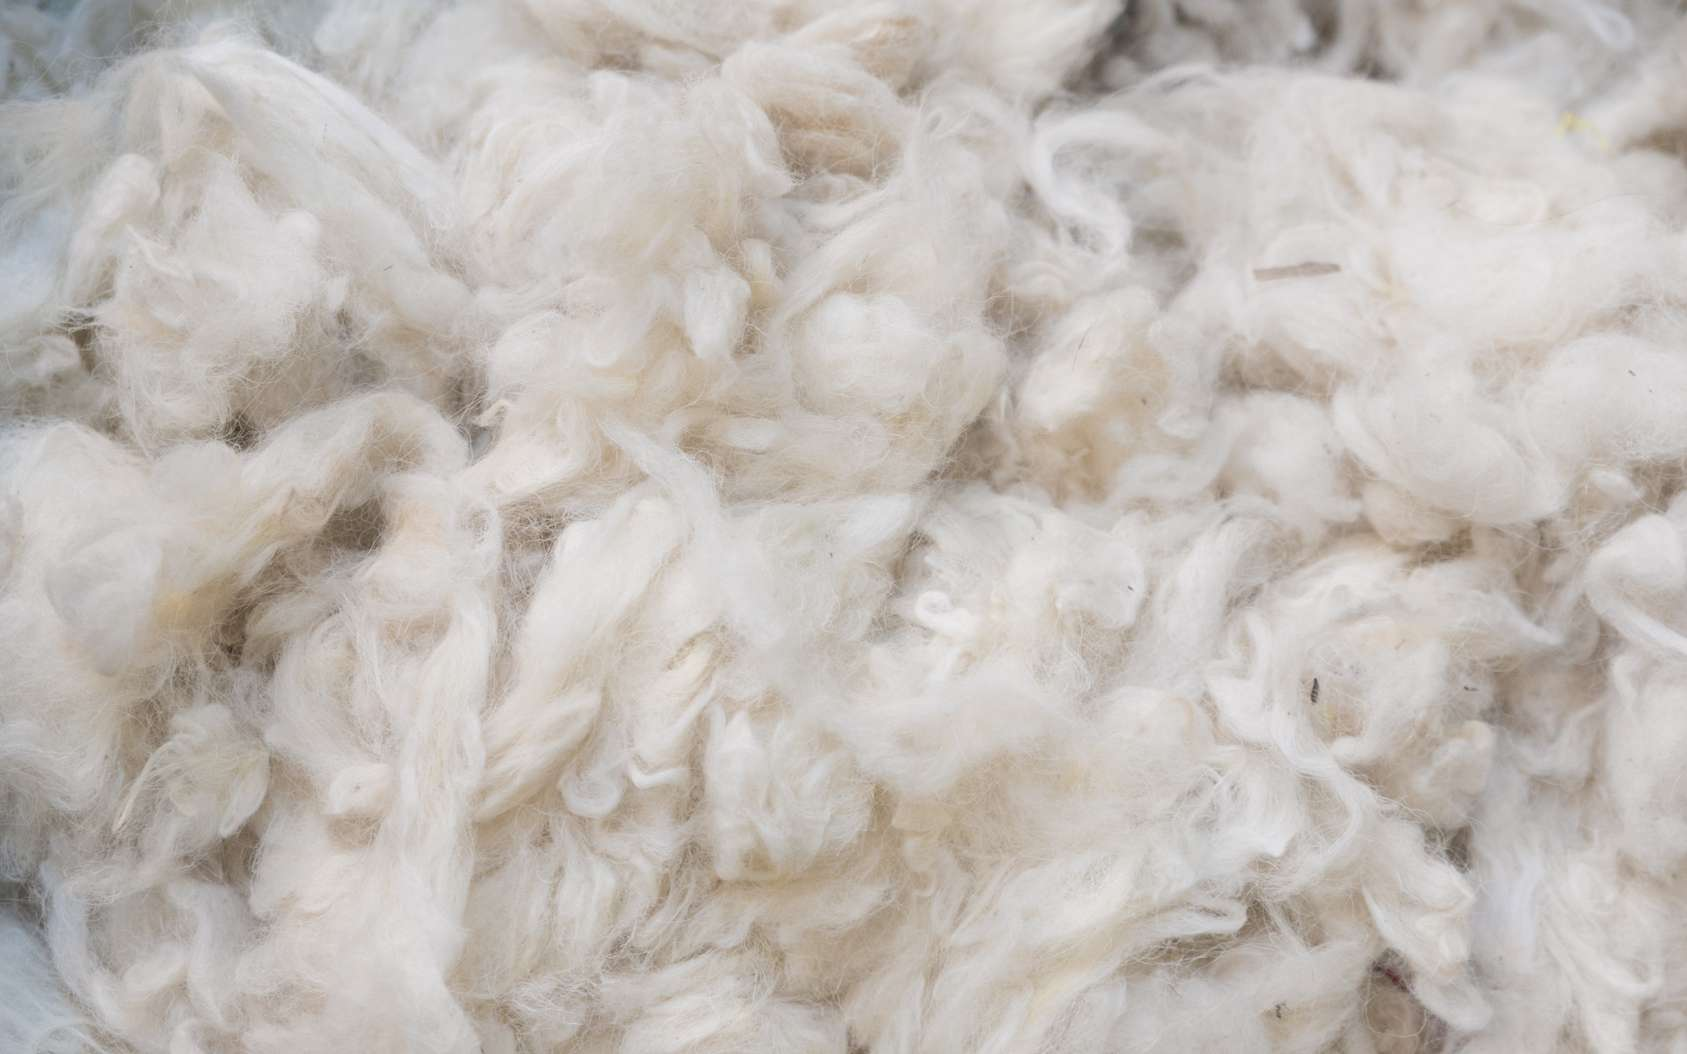 La laine mérinos est la plus fine au monde. © mastersky, Fotolia